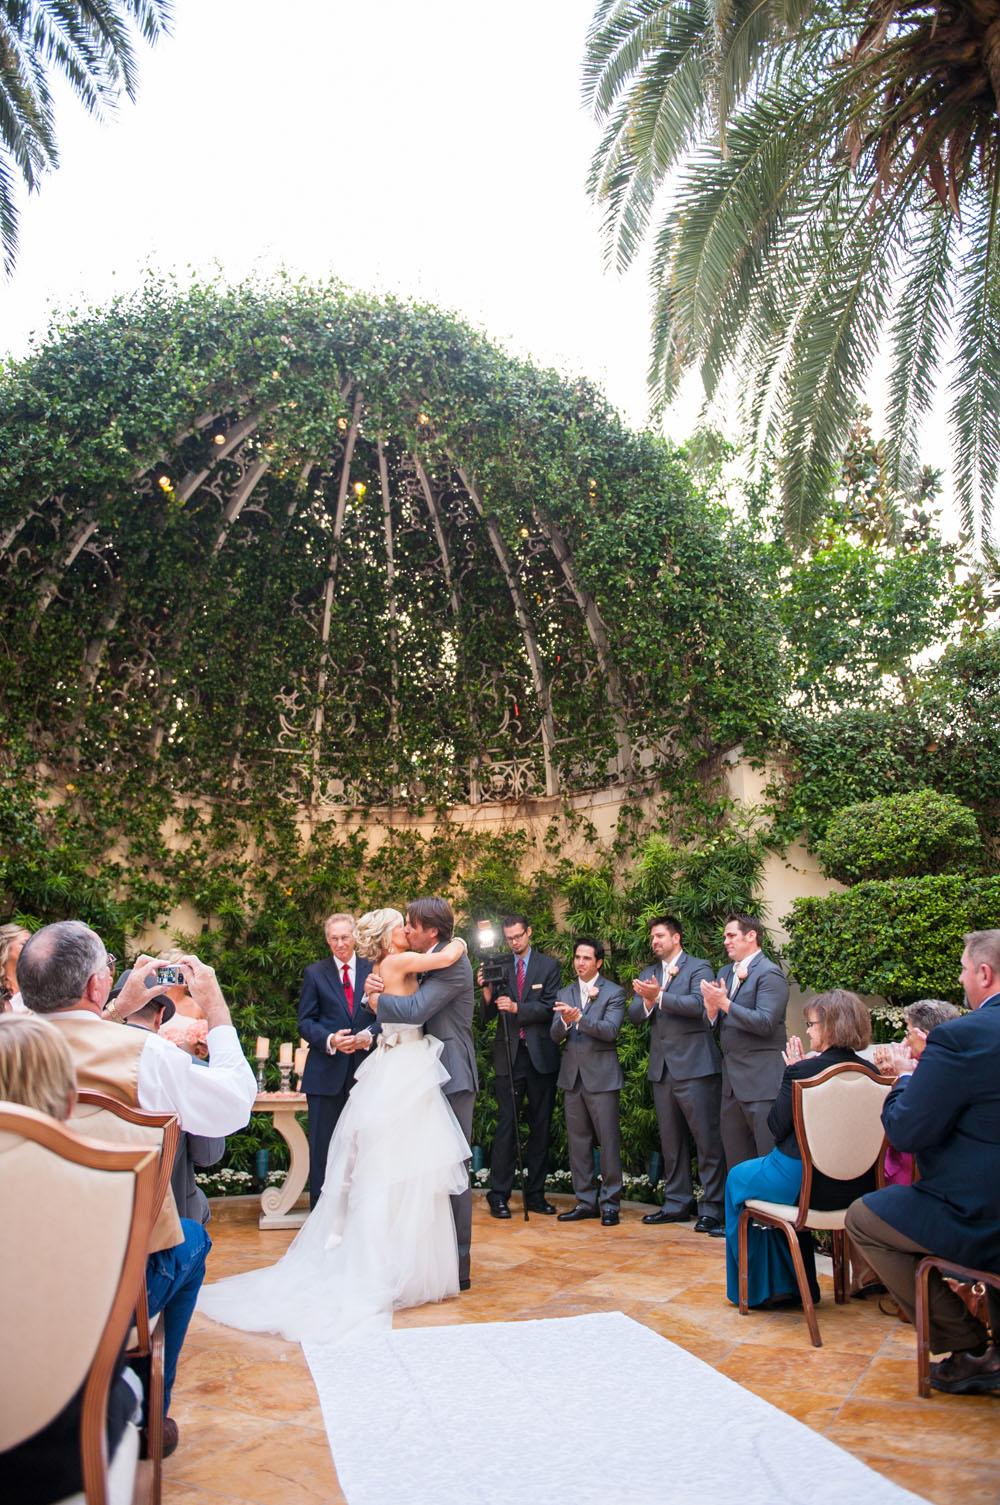 Nature Wedding Invitations as nice invitations design